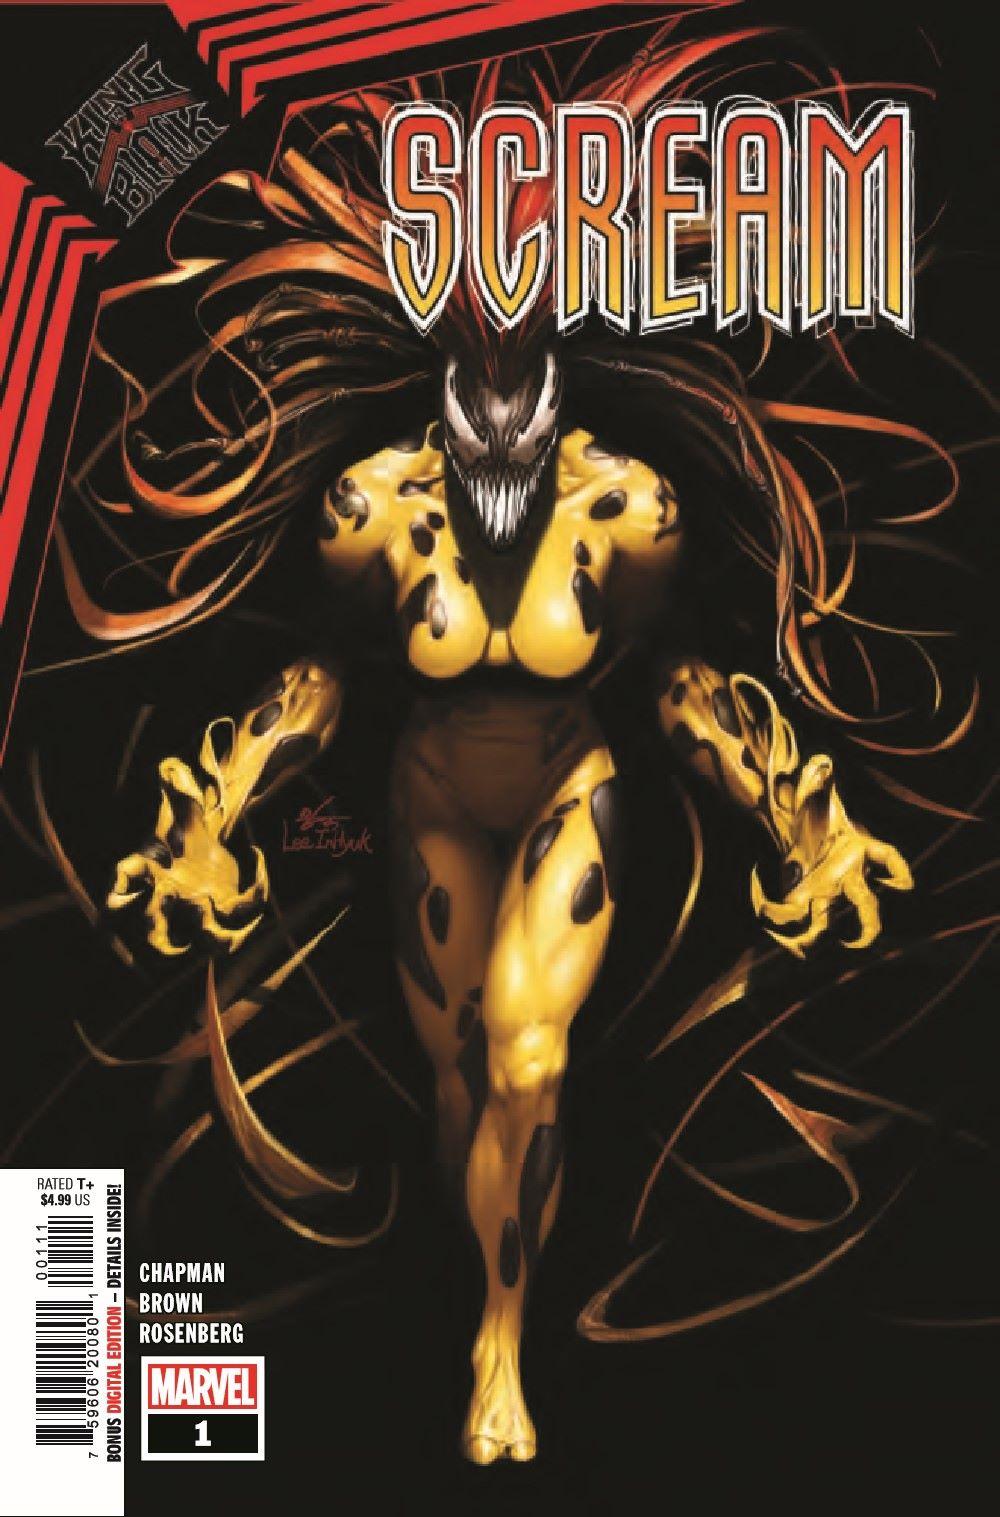 SCREAMKIB2021001_Preview-1 ComicList Previews: KING IN BLACK SCREAM #1